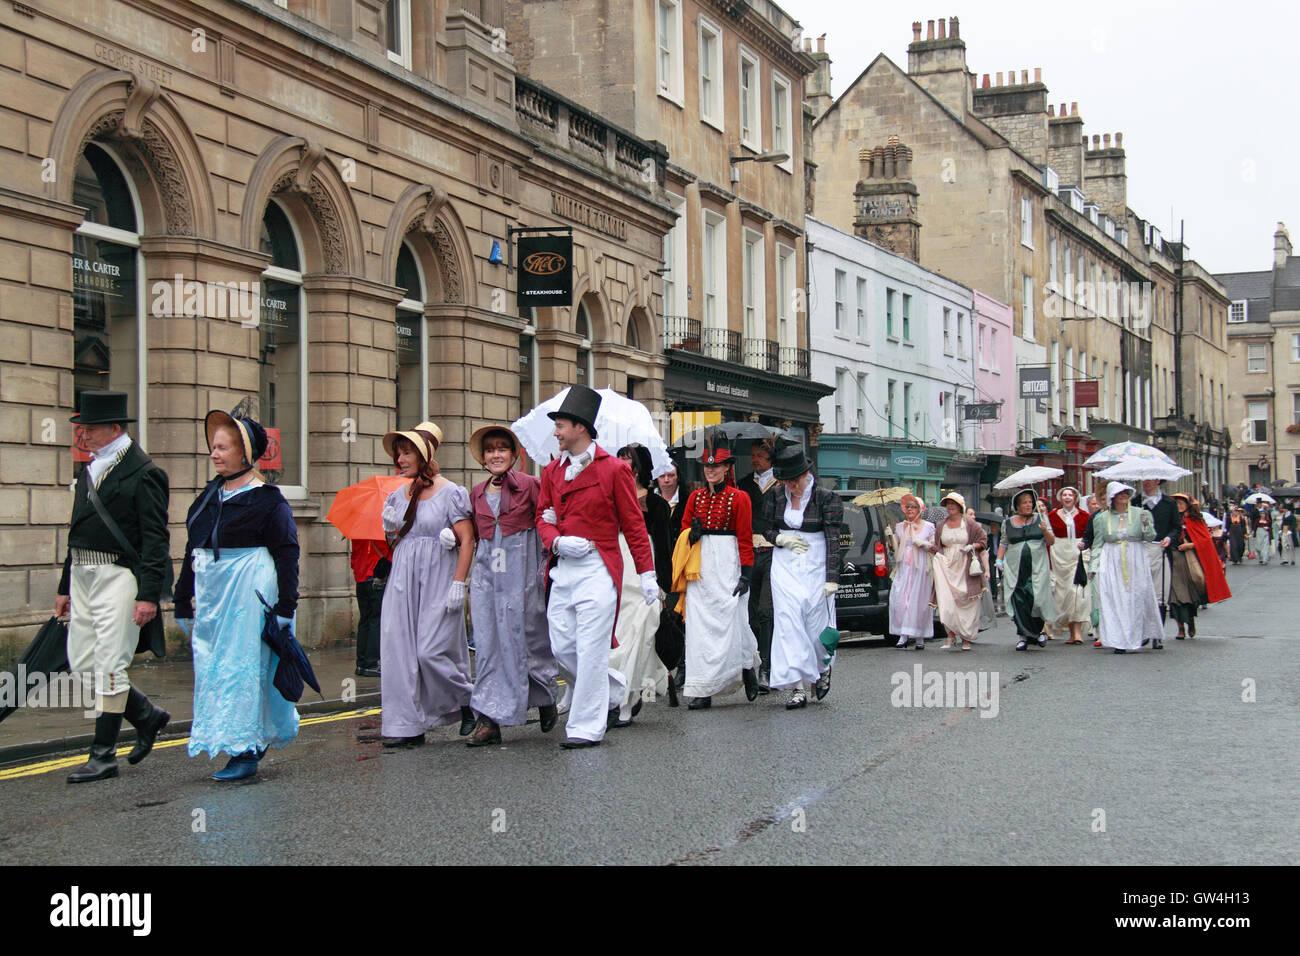 Jane Austen Festival. 9ª-18ª de septiembre de 2016. Bath, Somerset, Inglaterra, Reino Unido. La lluvia Imagen De Stock